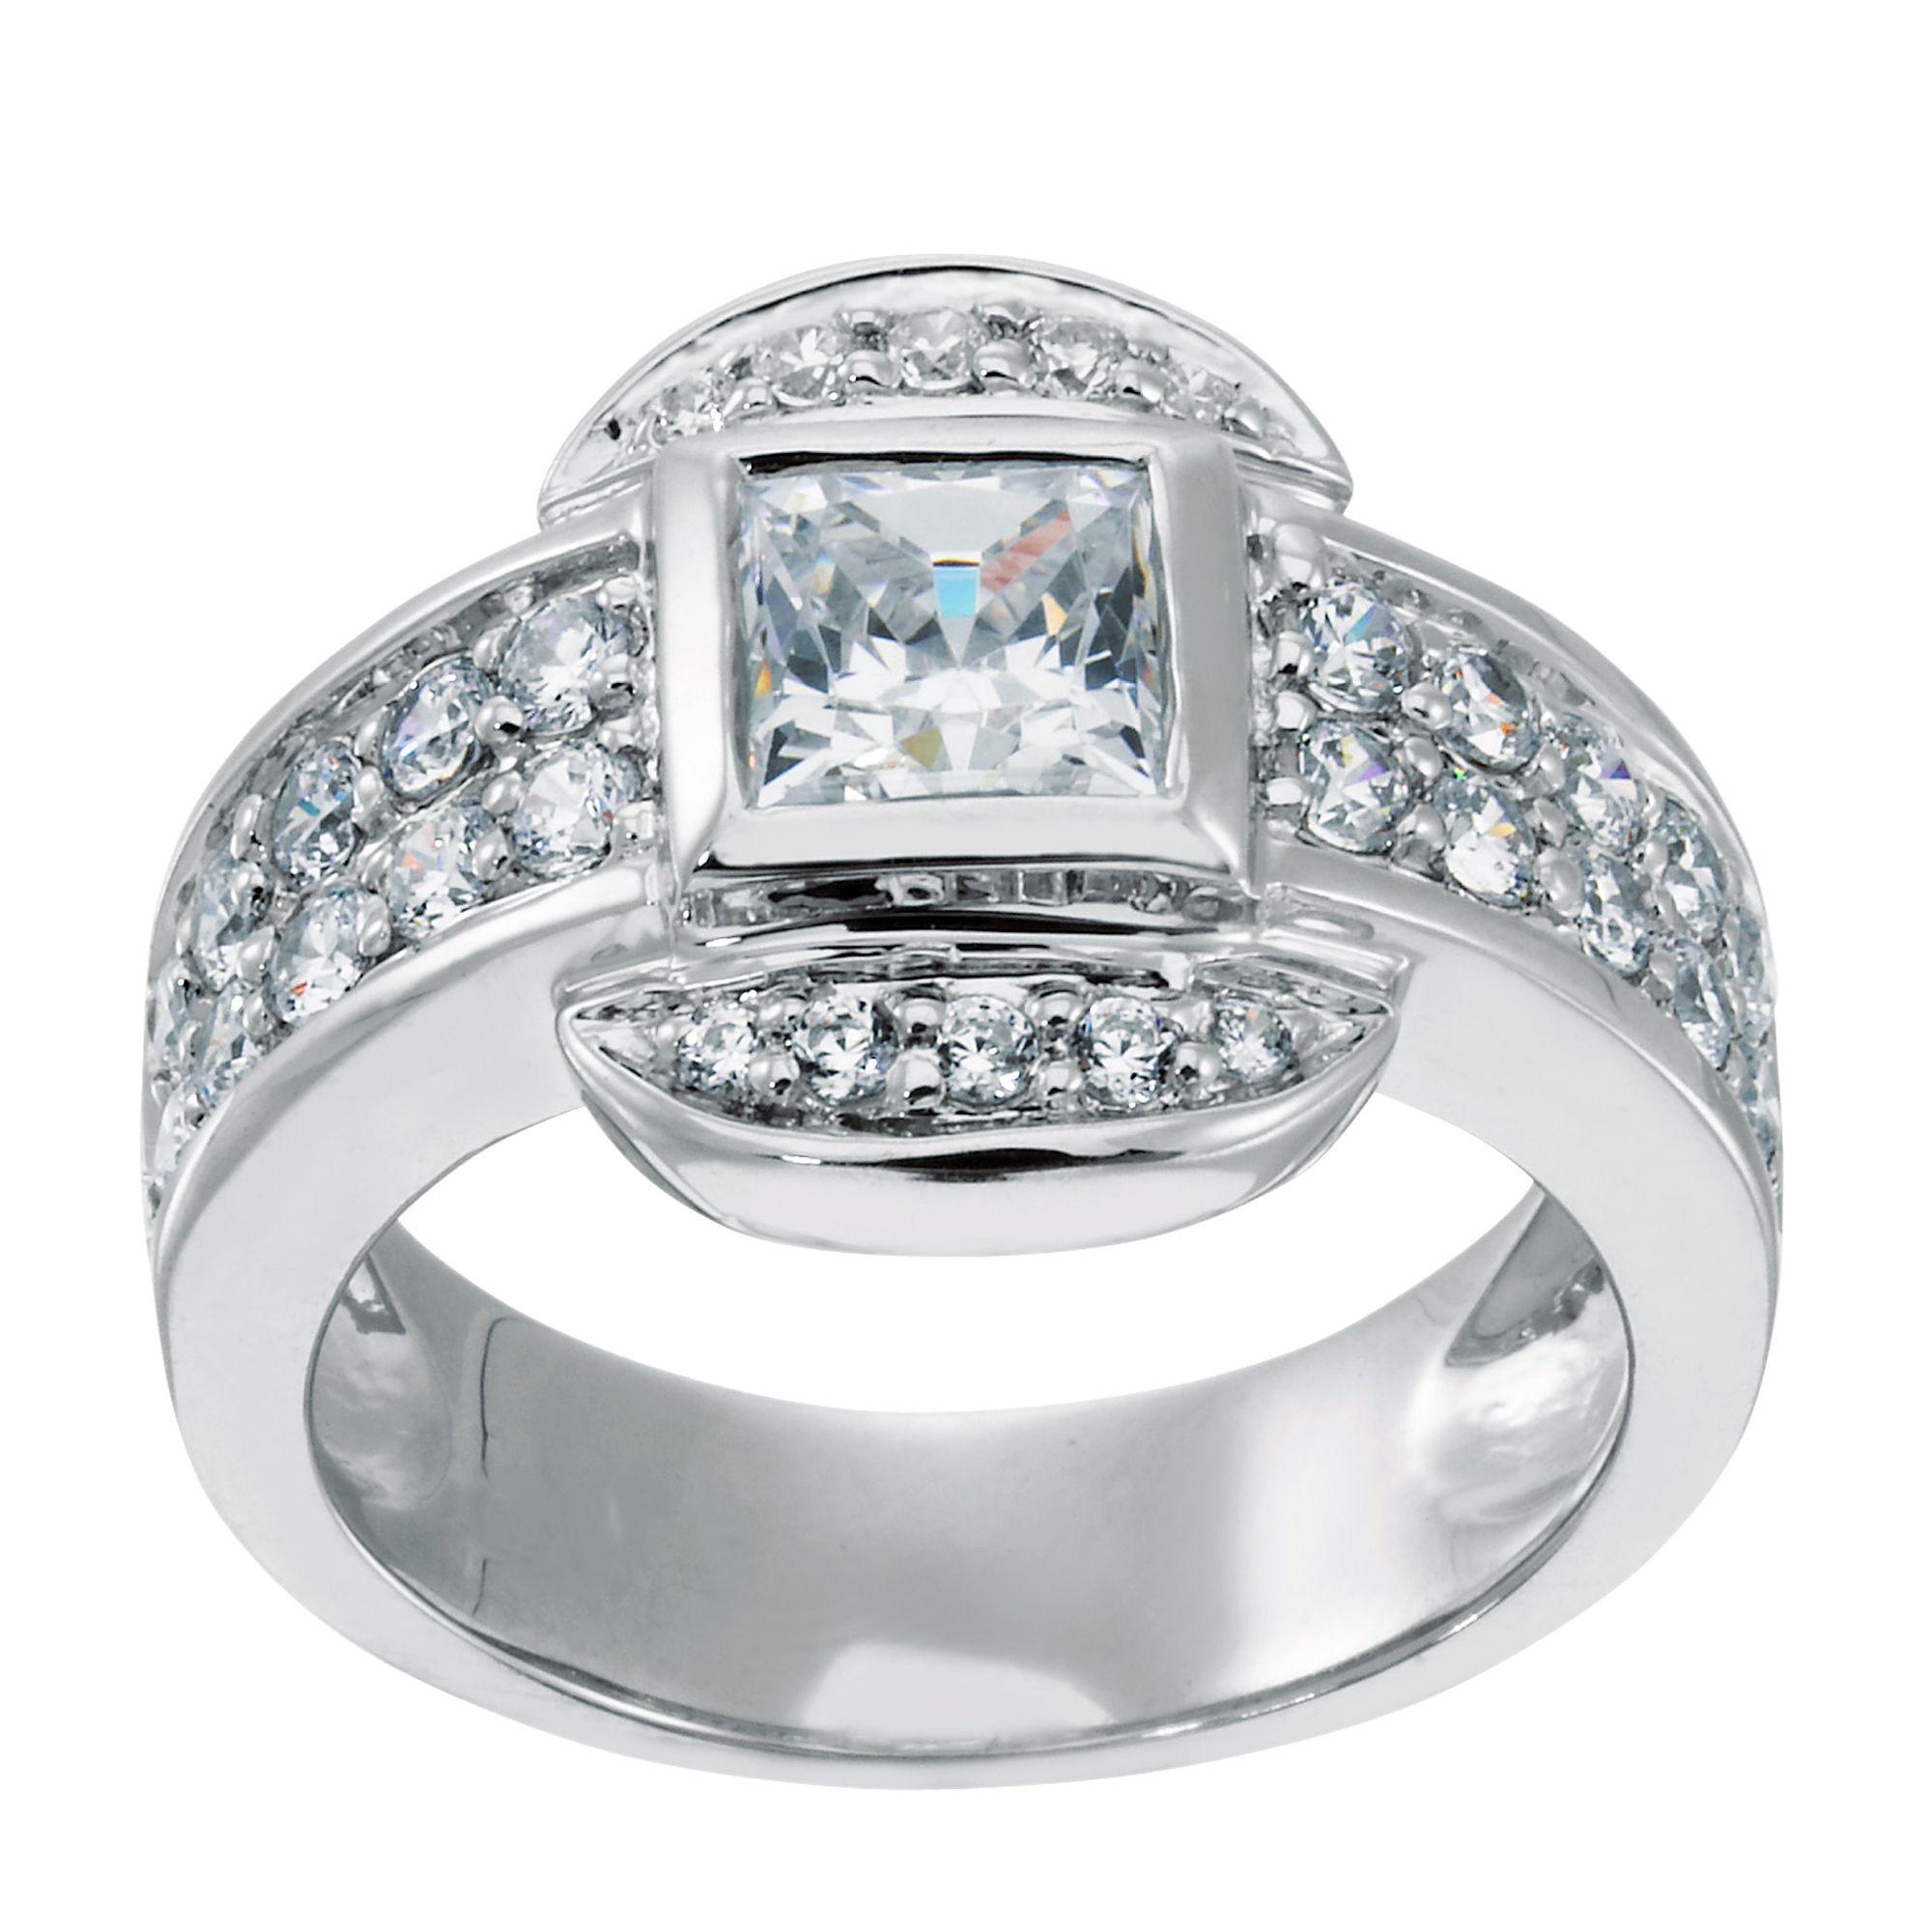 Lorian Platinum 0.99 ct Princess Cut Lab Created Engagement Ring $275